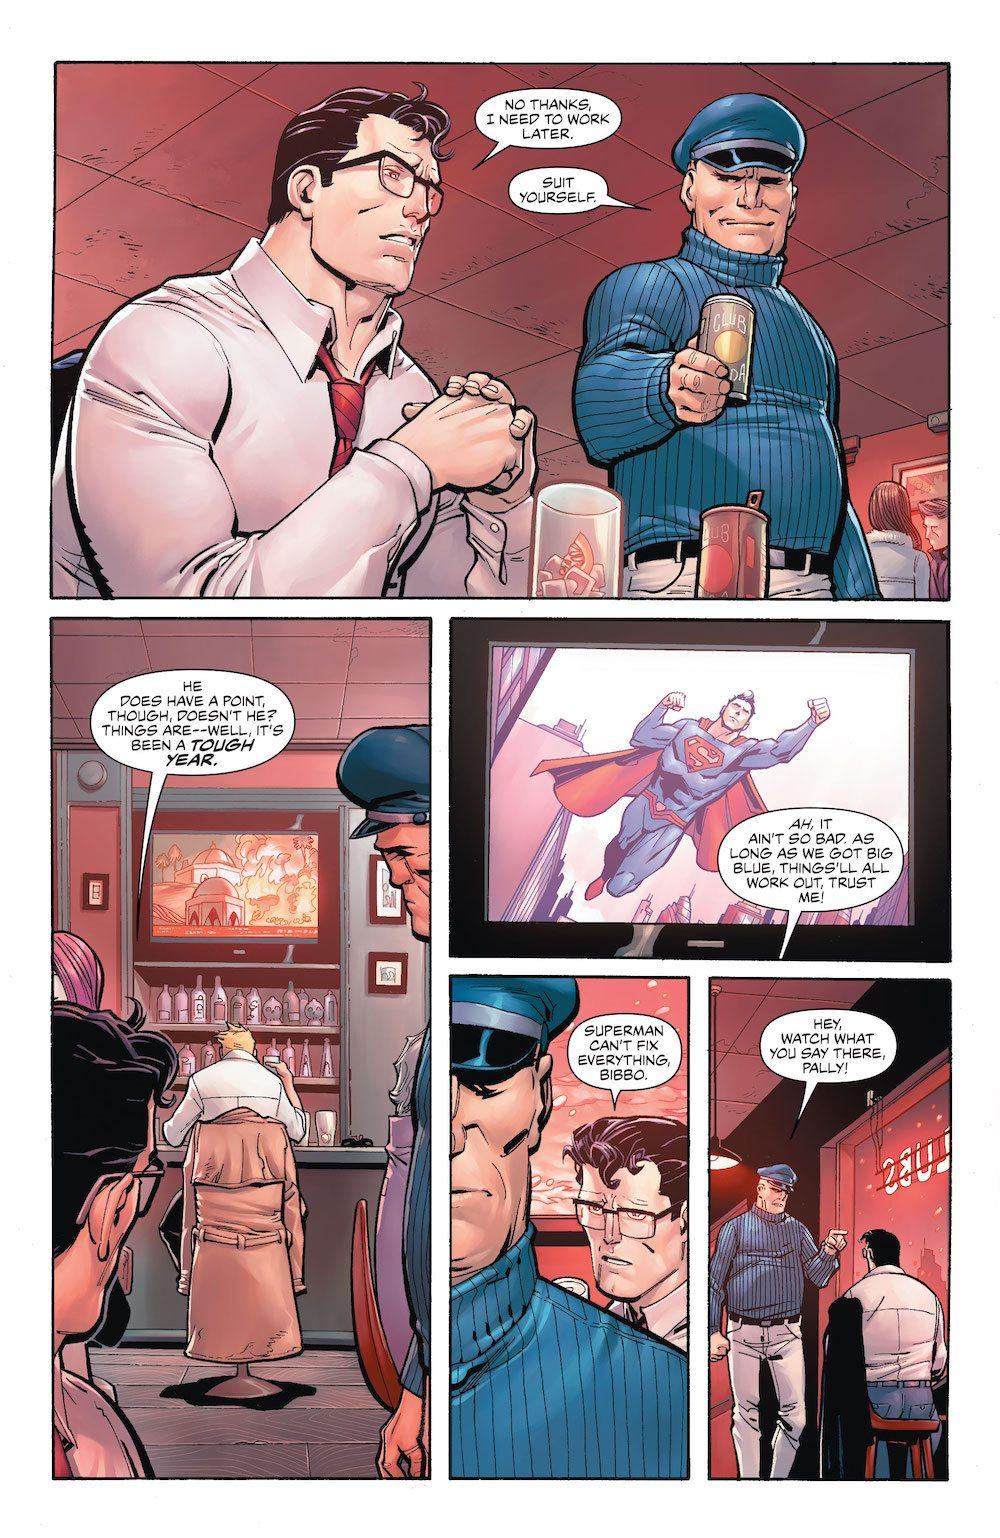 Bibbo, Clark Kent, DC Holiday Special 2017